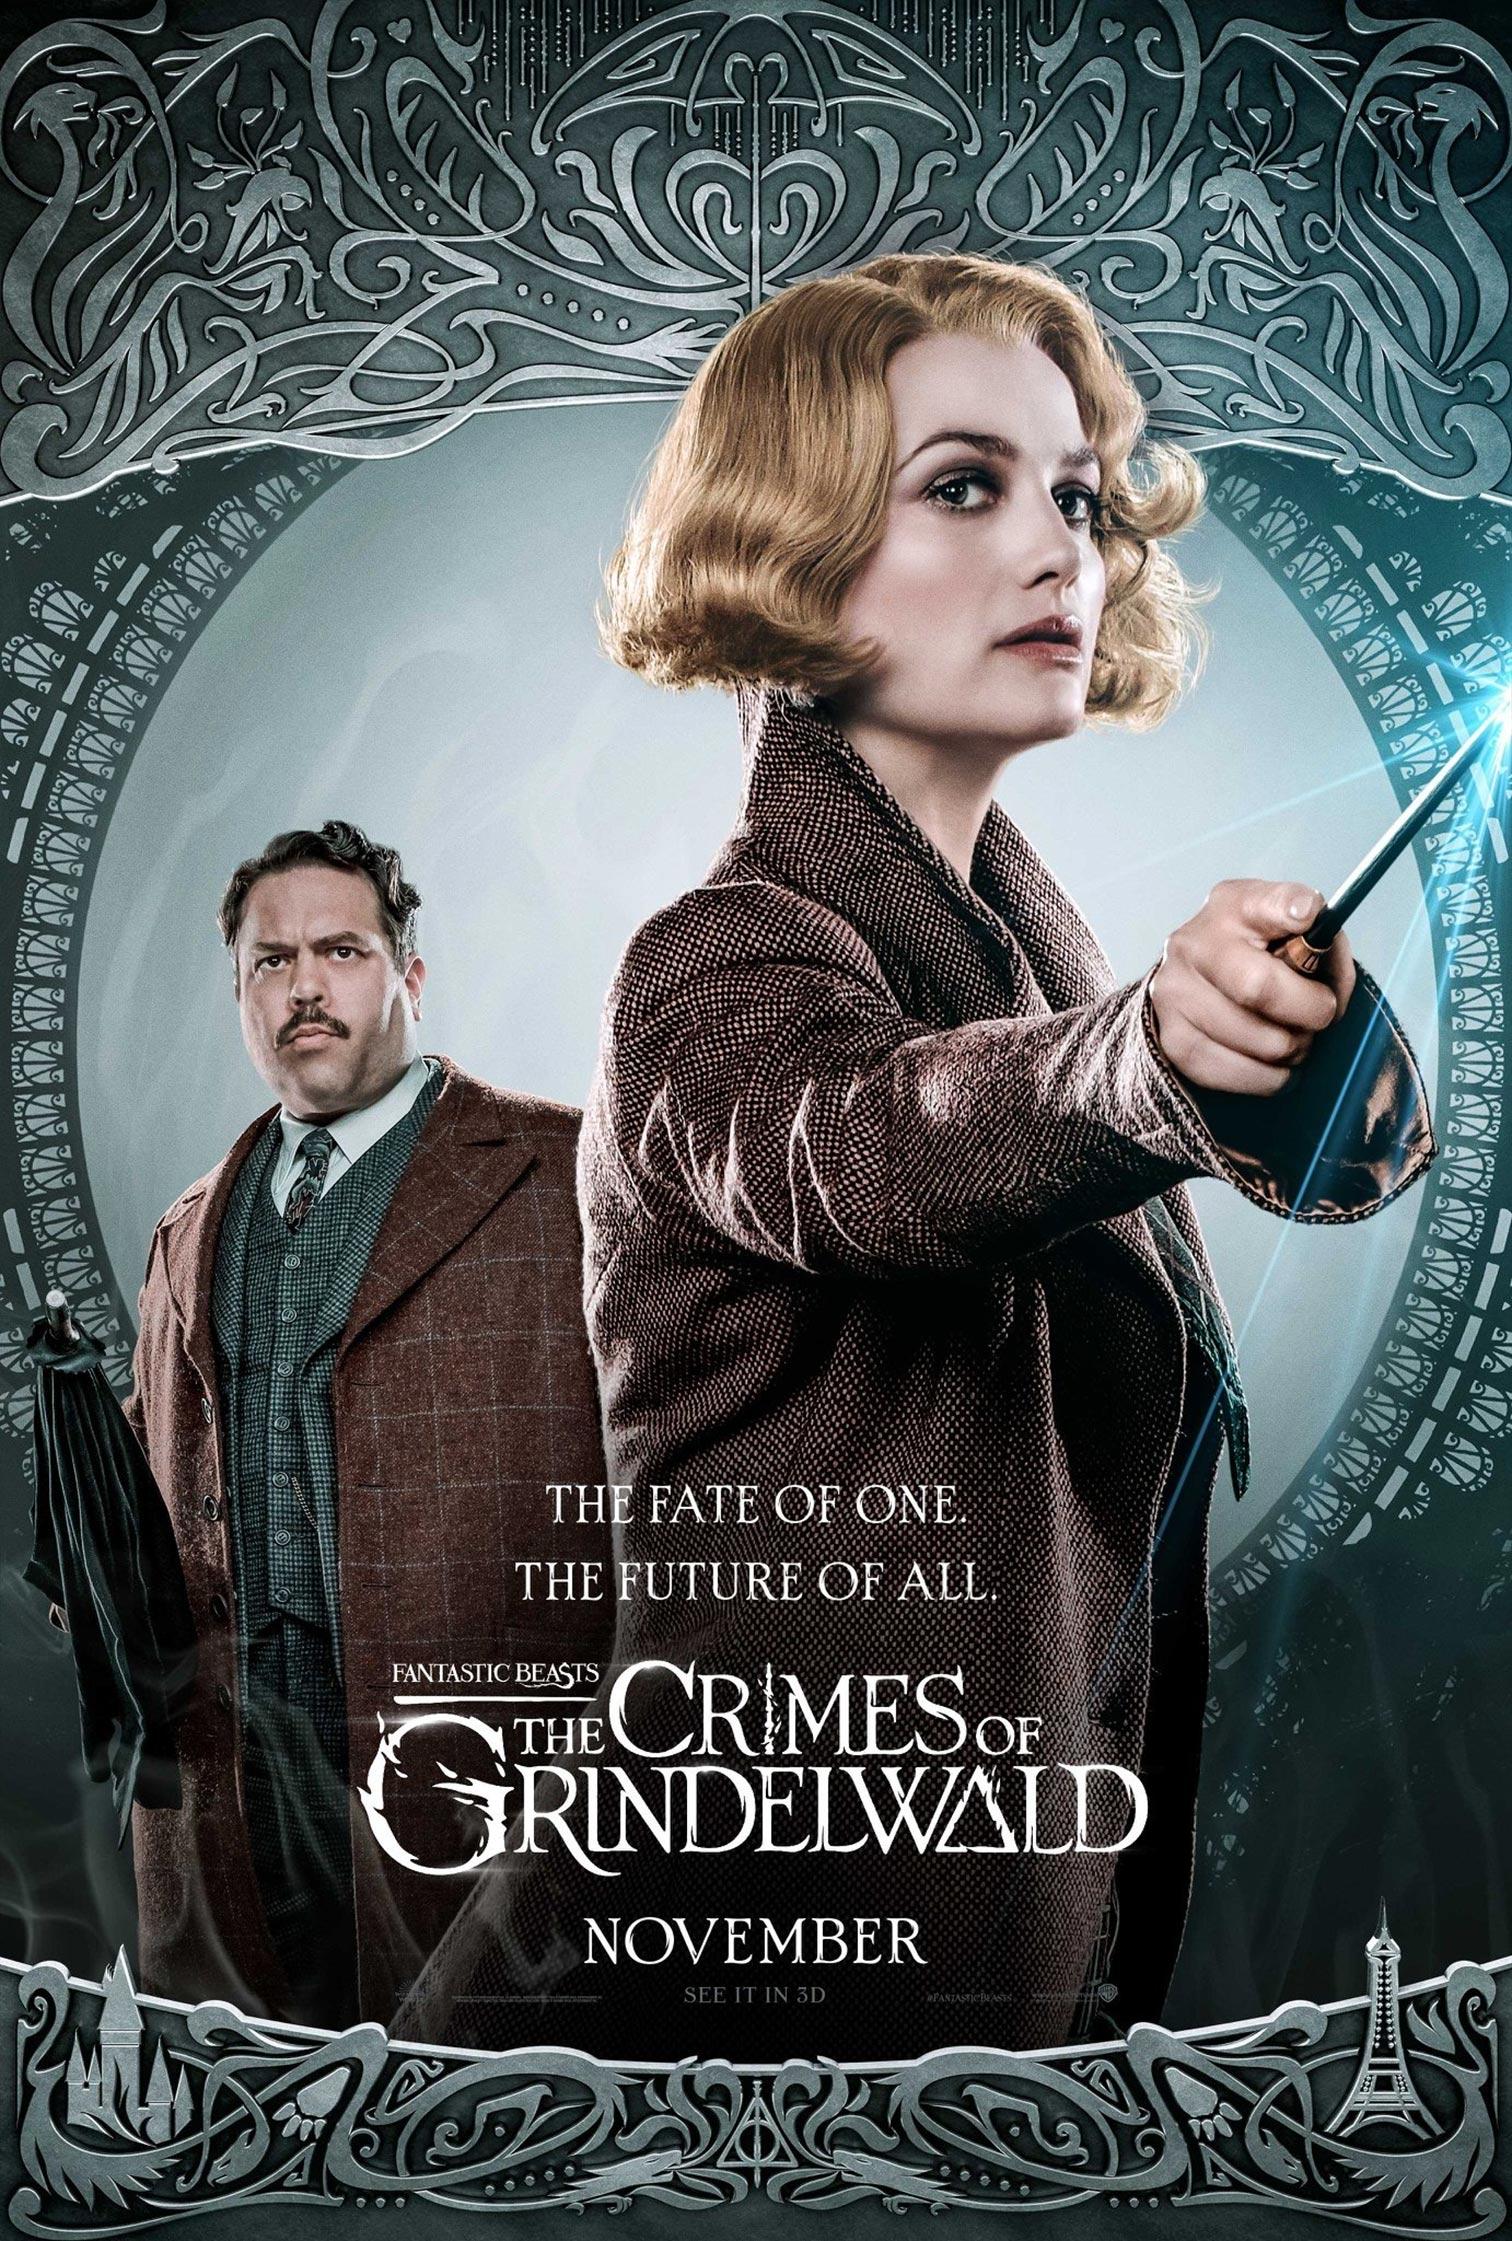 Fantastic Beasts: The Crimes of Grindelwald Poster #16